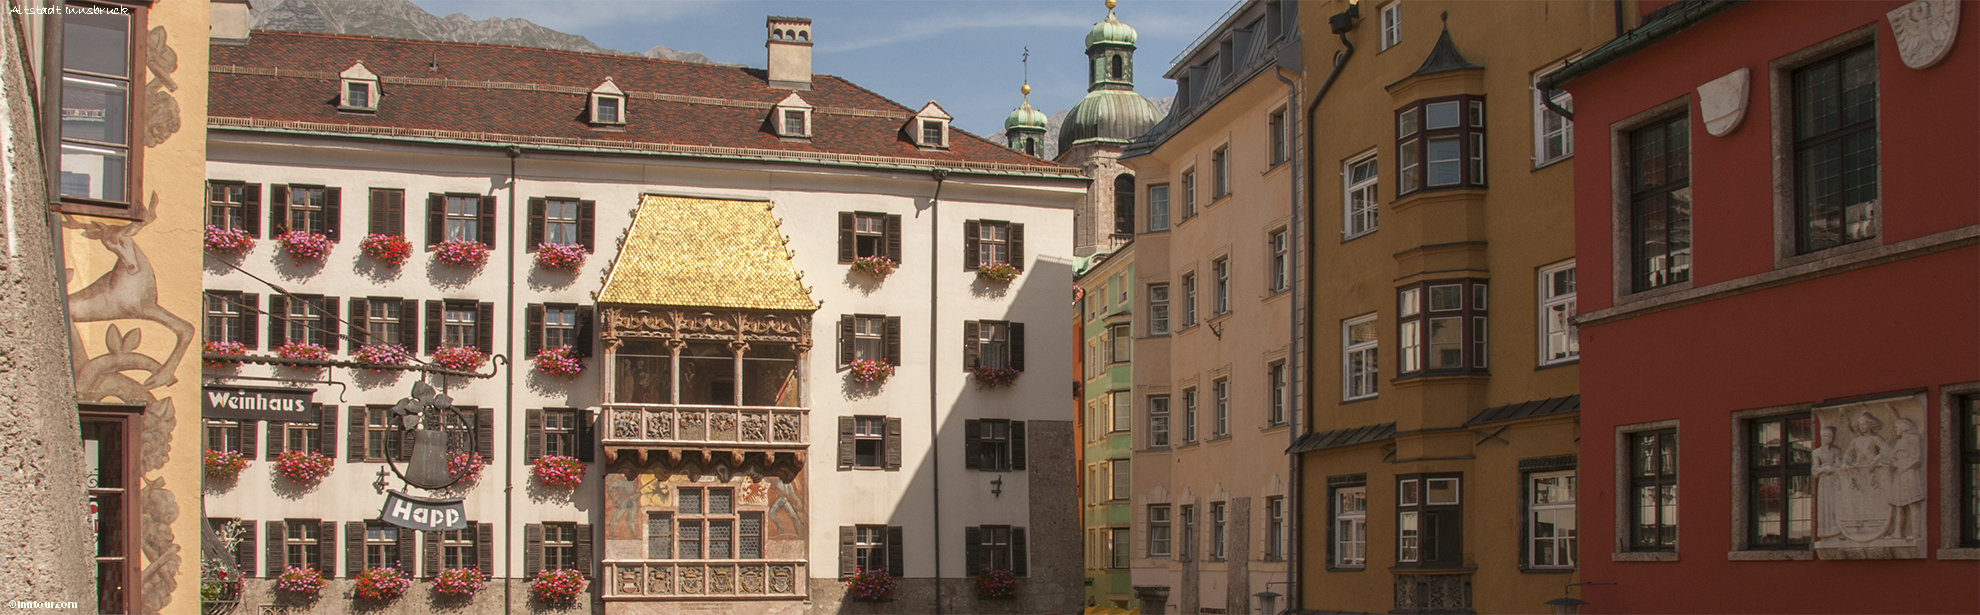 Oklassinntour_Innsbruck-Altstadt_DSC_2500-2